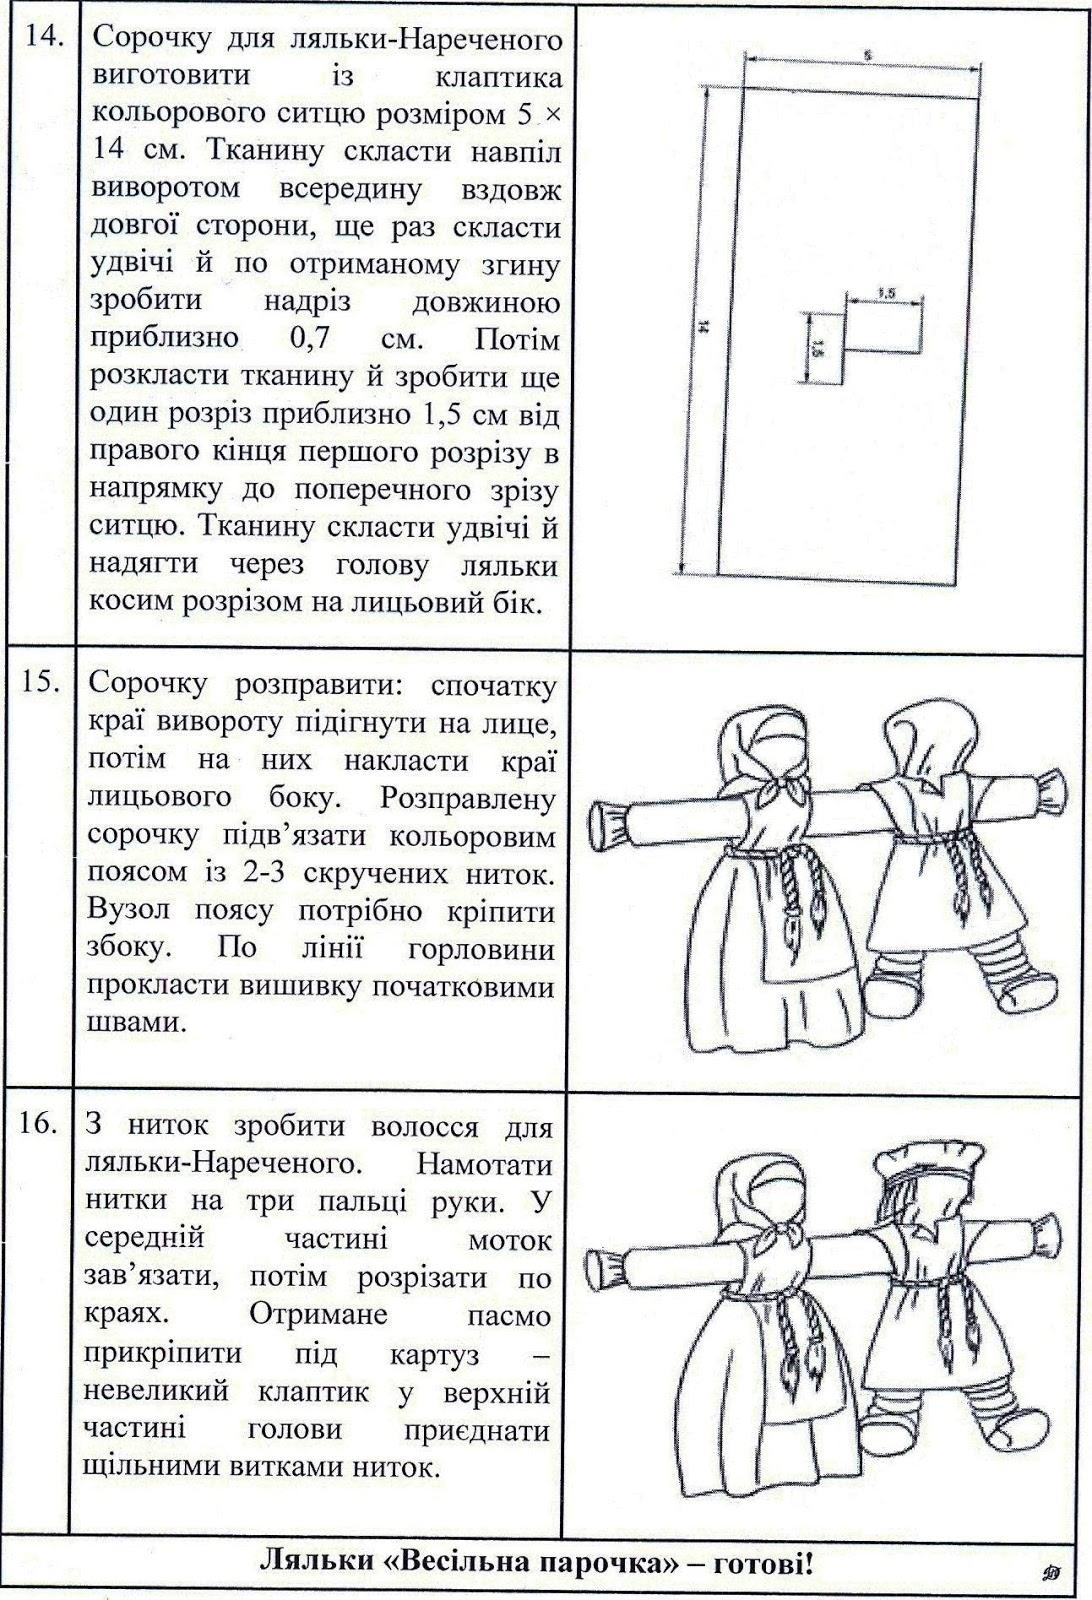 Dolls by Marina Dyachenko  4.7. ДОДАТКОВІ МАТЕРІАЛИ 10861e81a1931